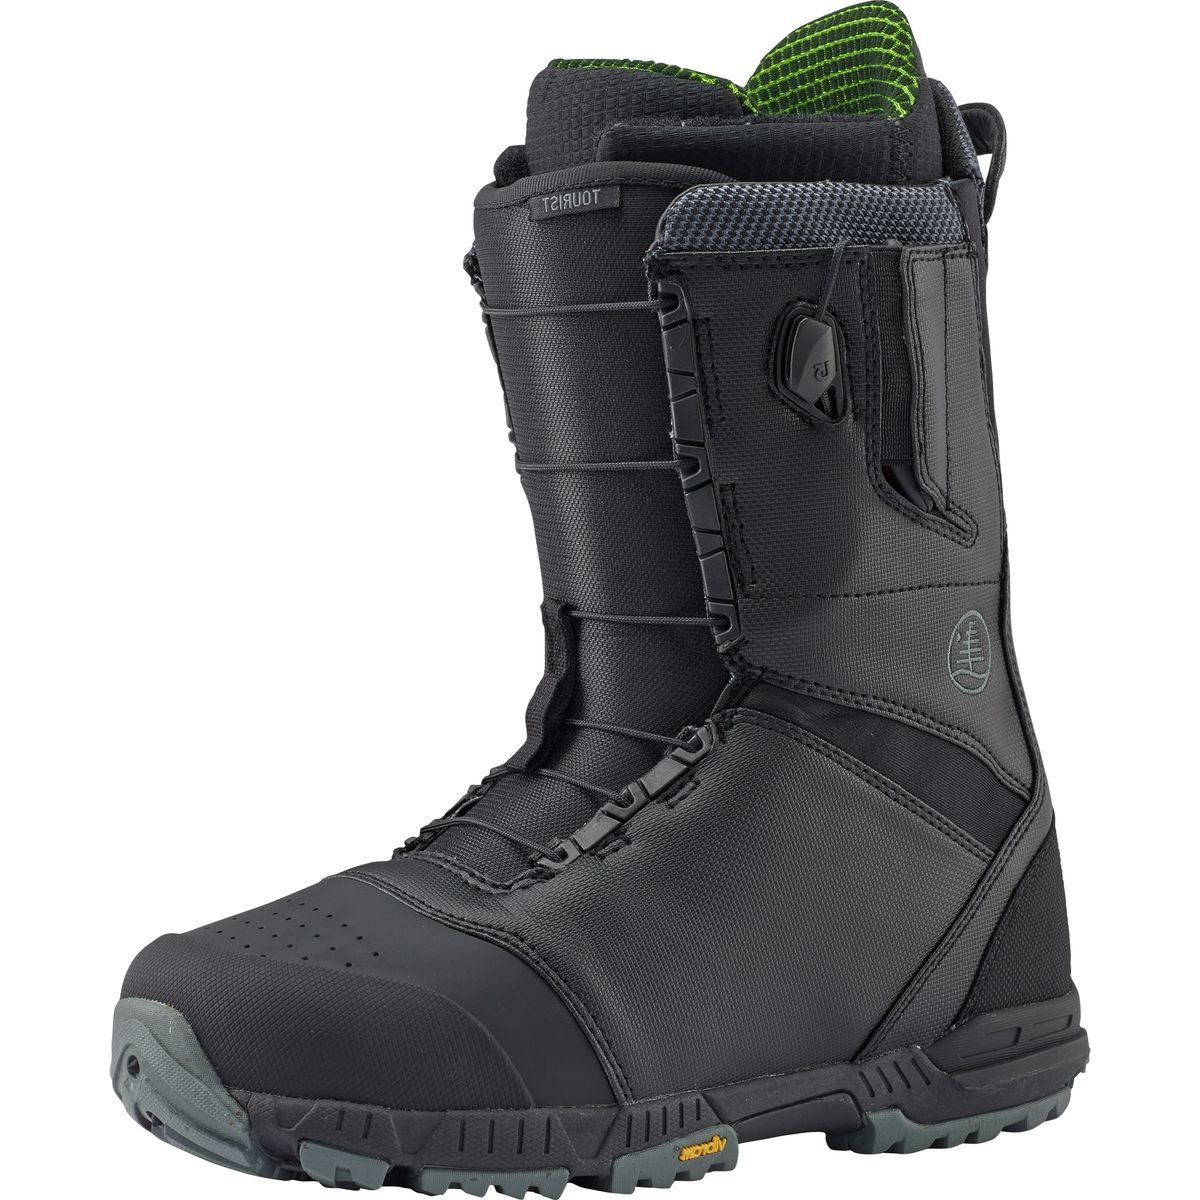 Burton Tourist Snowboard Boot - Men's